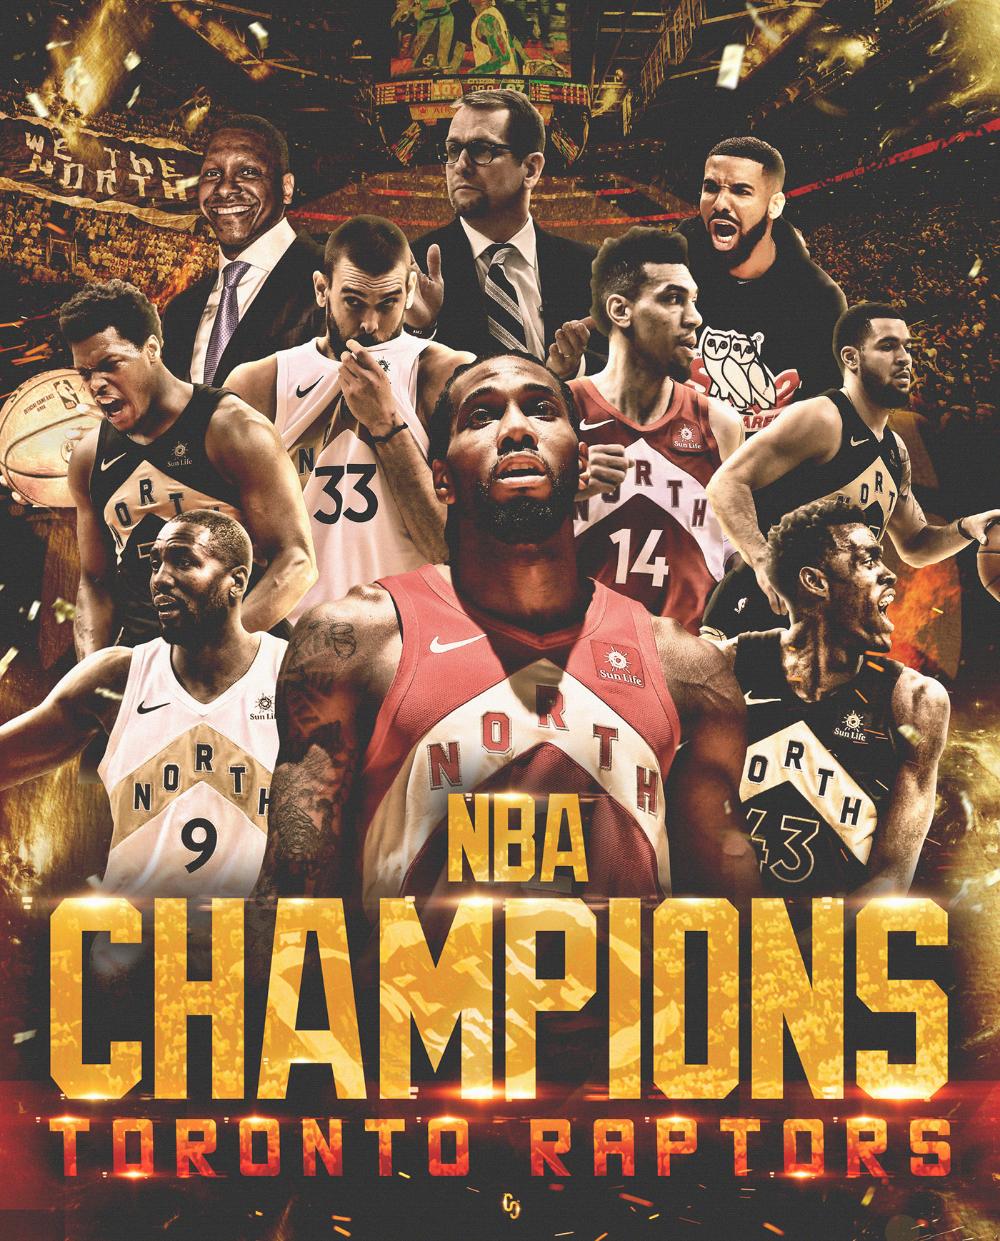 Behance Search Raptors Basketball Raptors Toronto Raptors